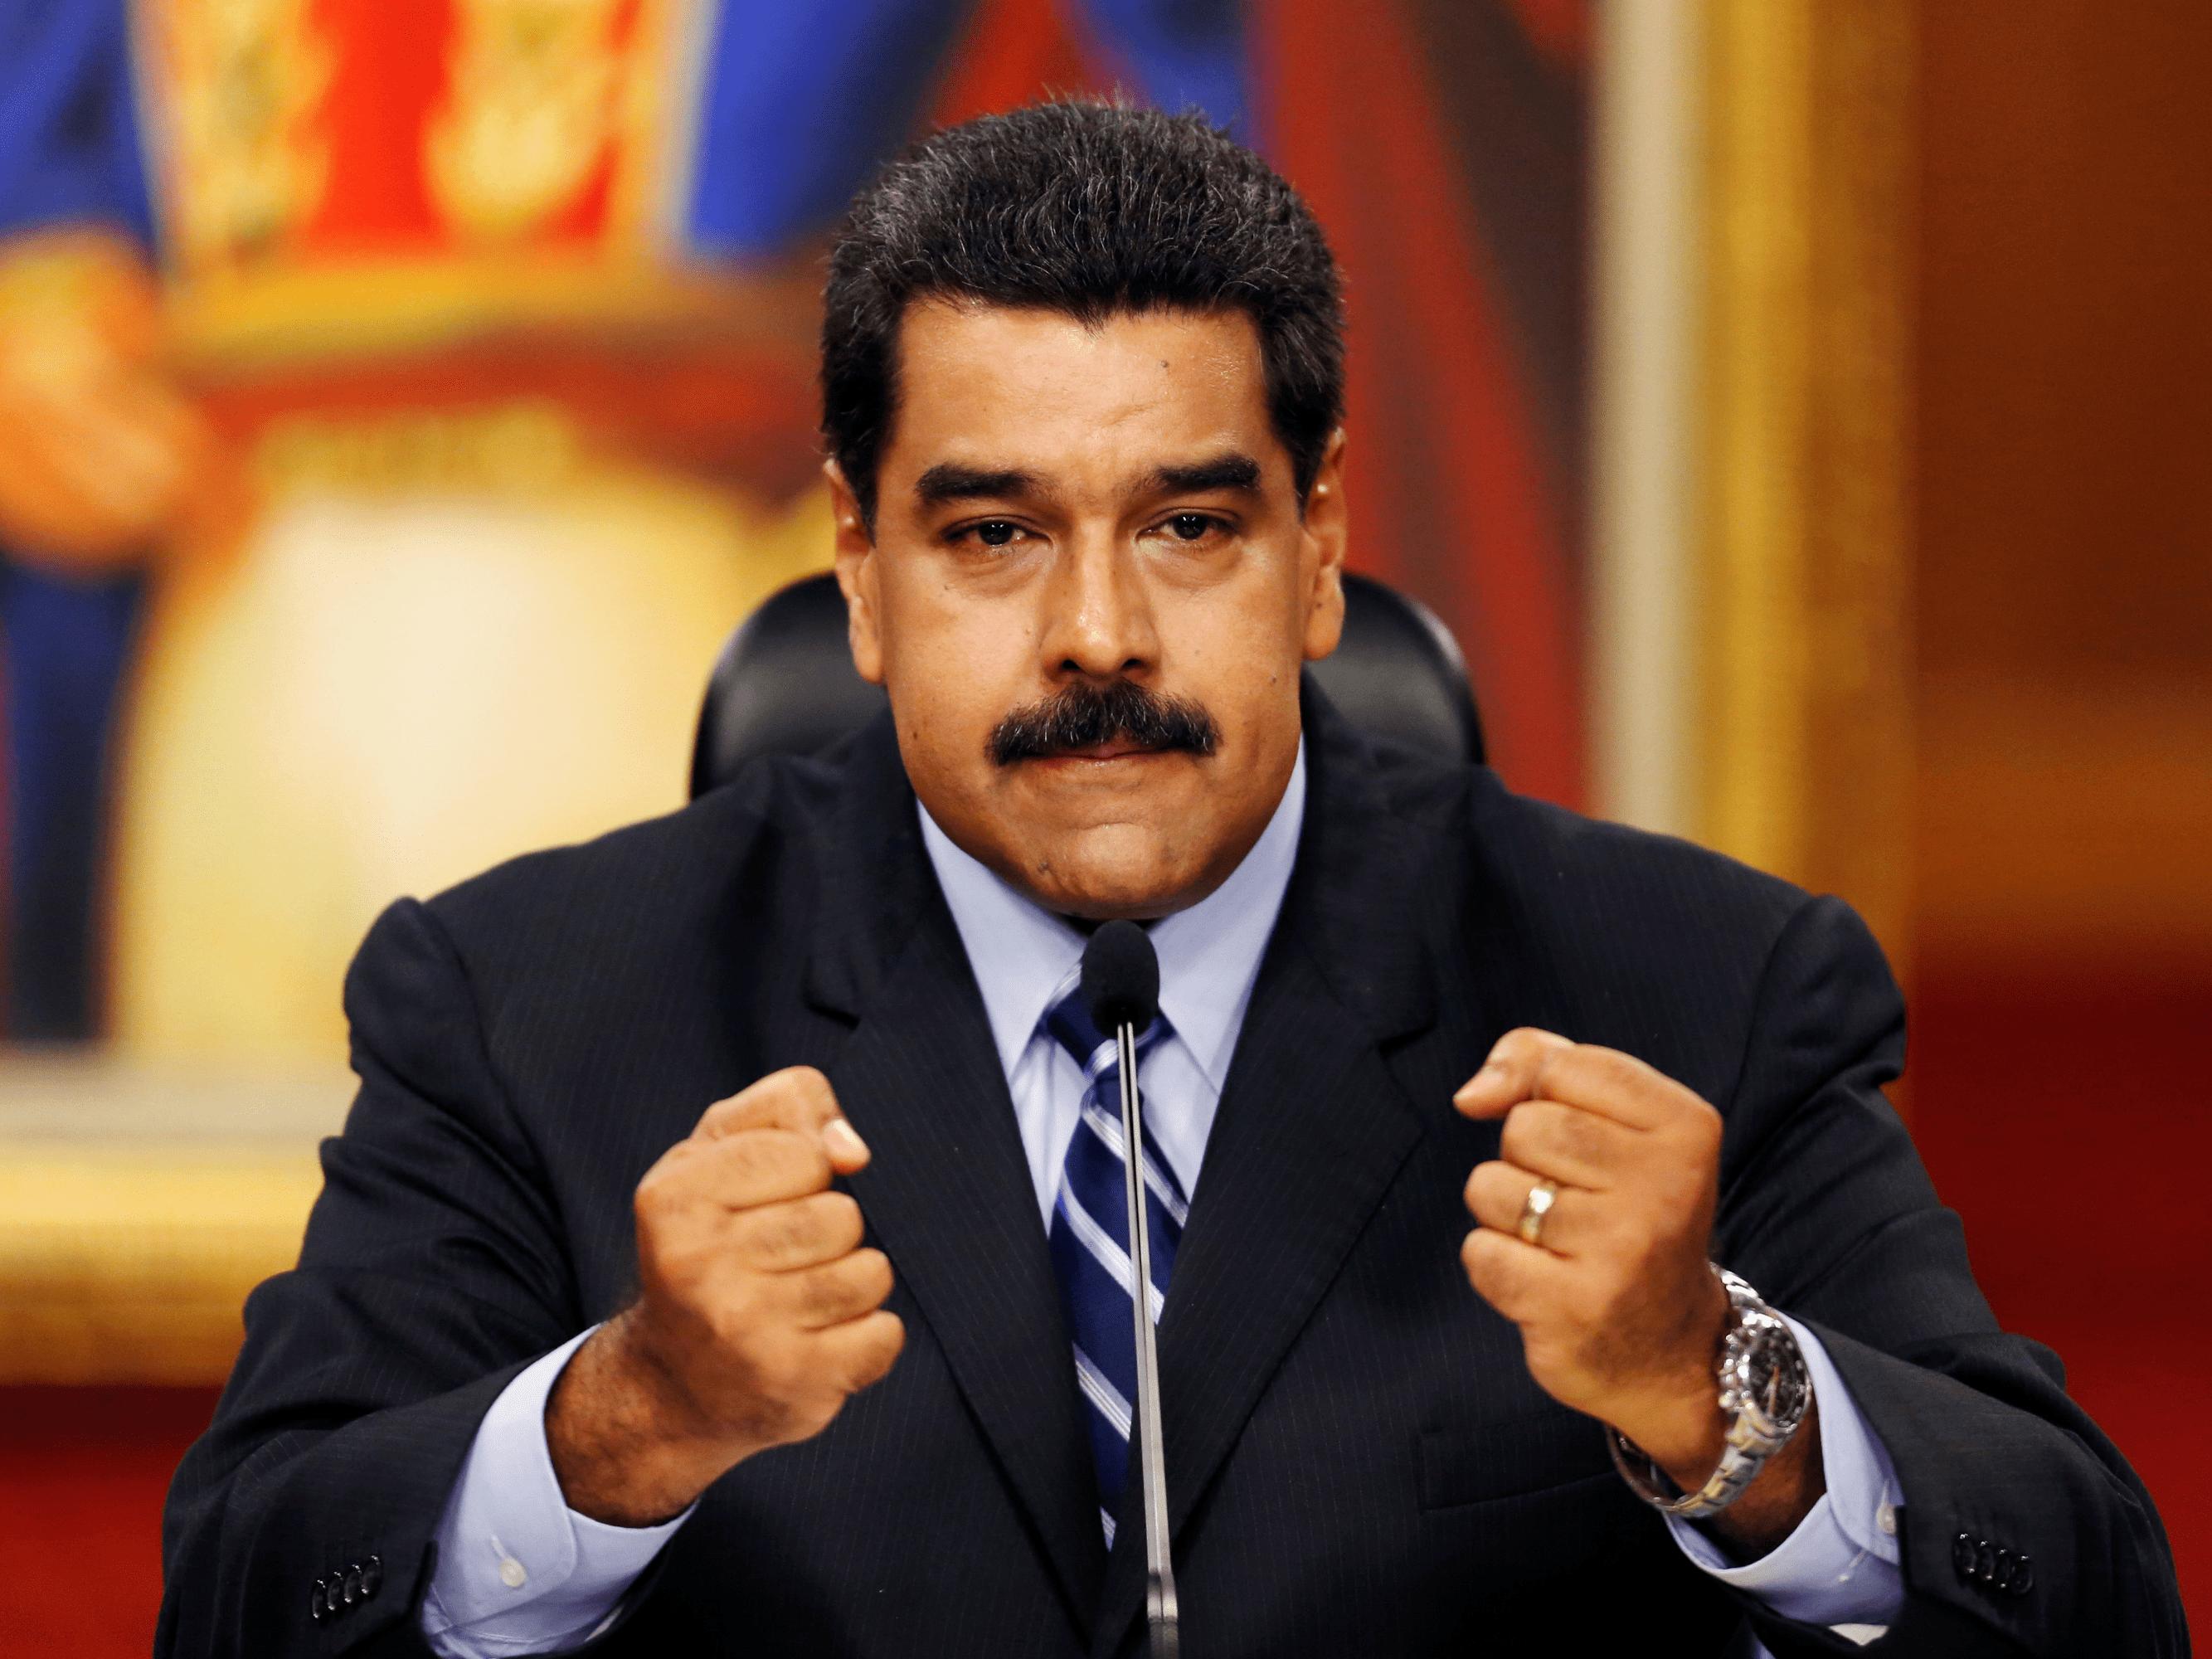 Presidente Nicolás Maduro no descarta venir a RD para diálogo con la oposición